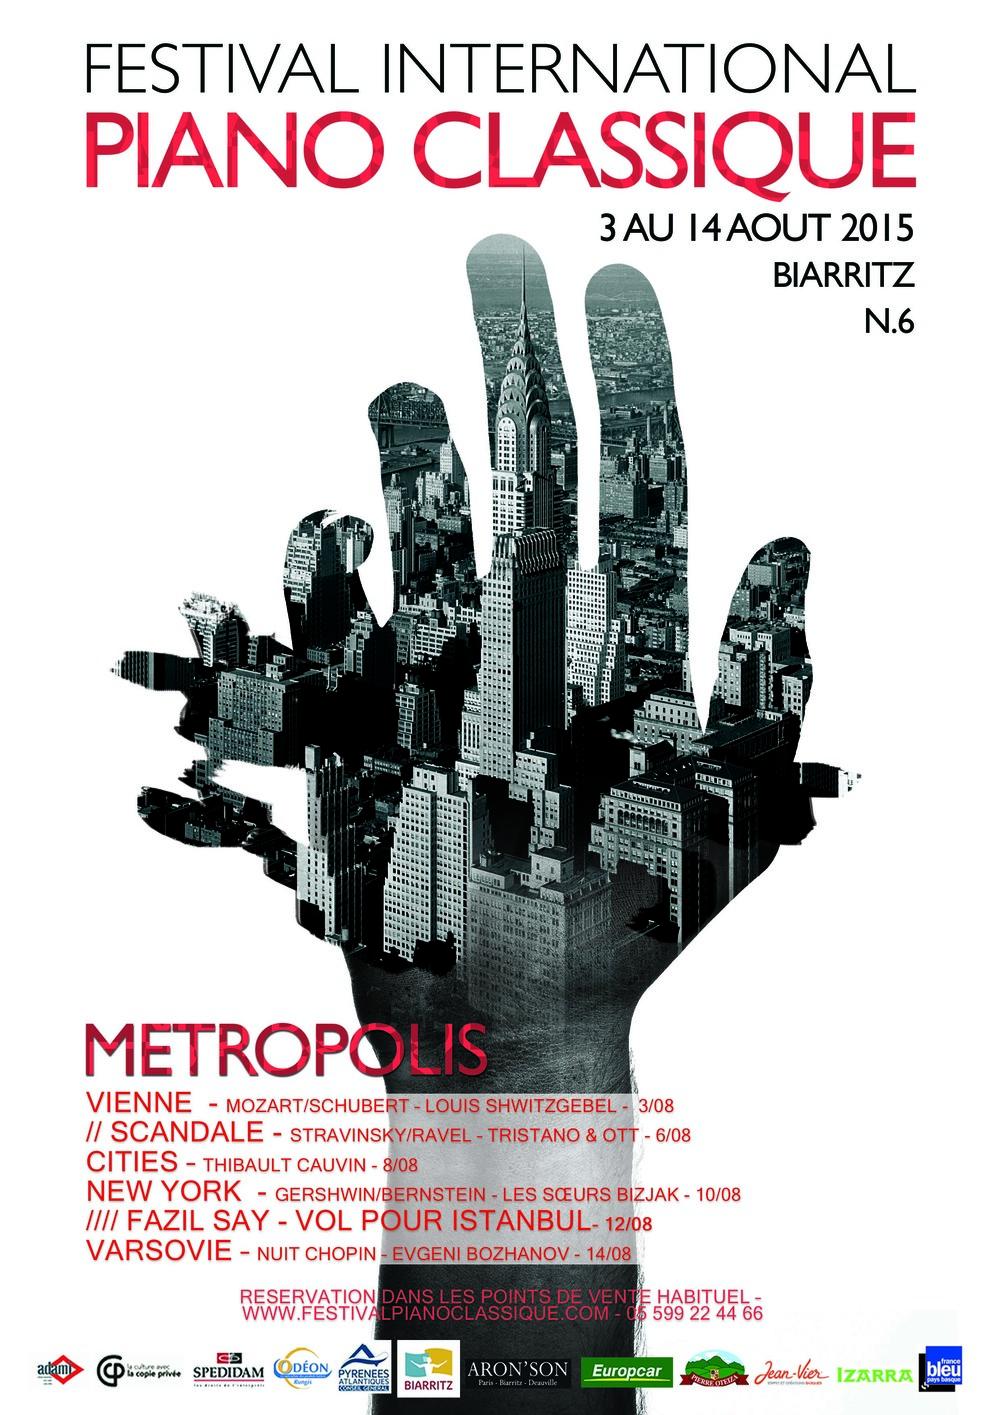 festivalpianoclassique-biarritz-aout-2015